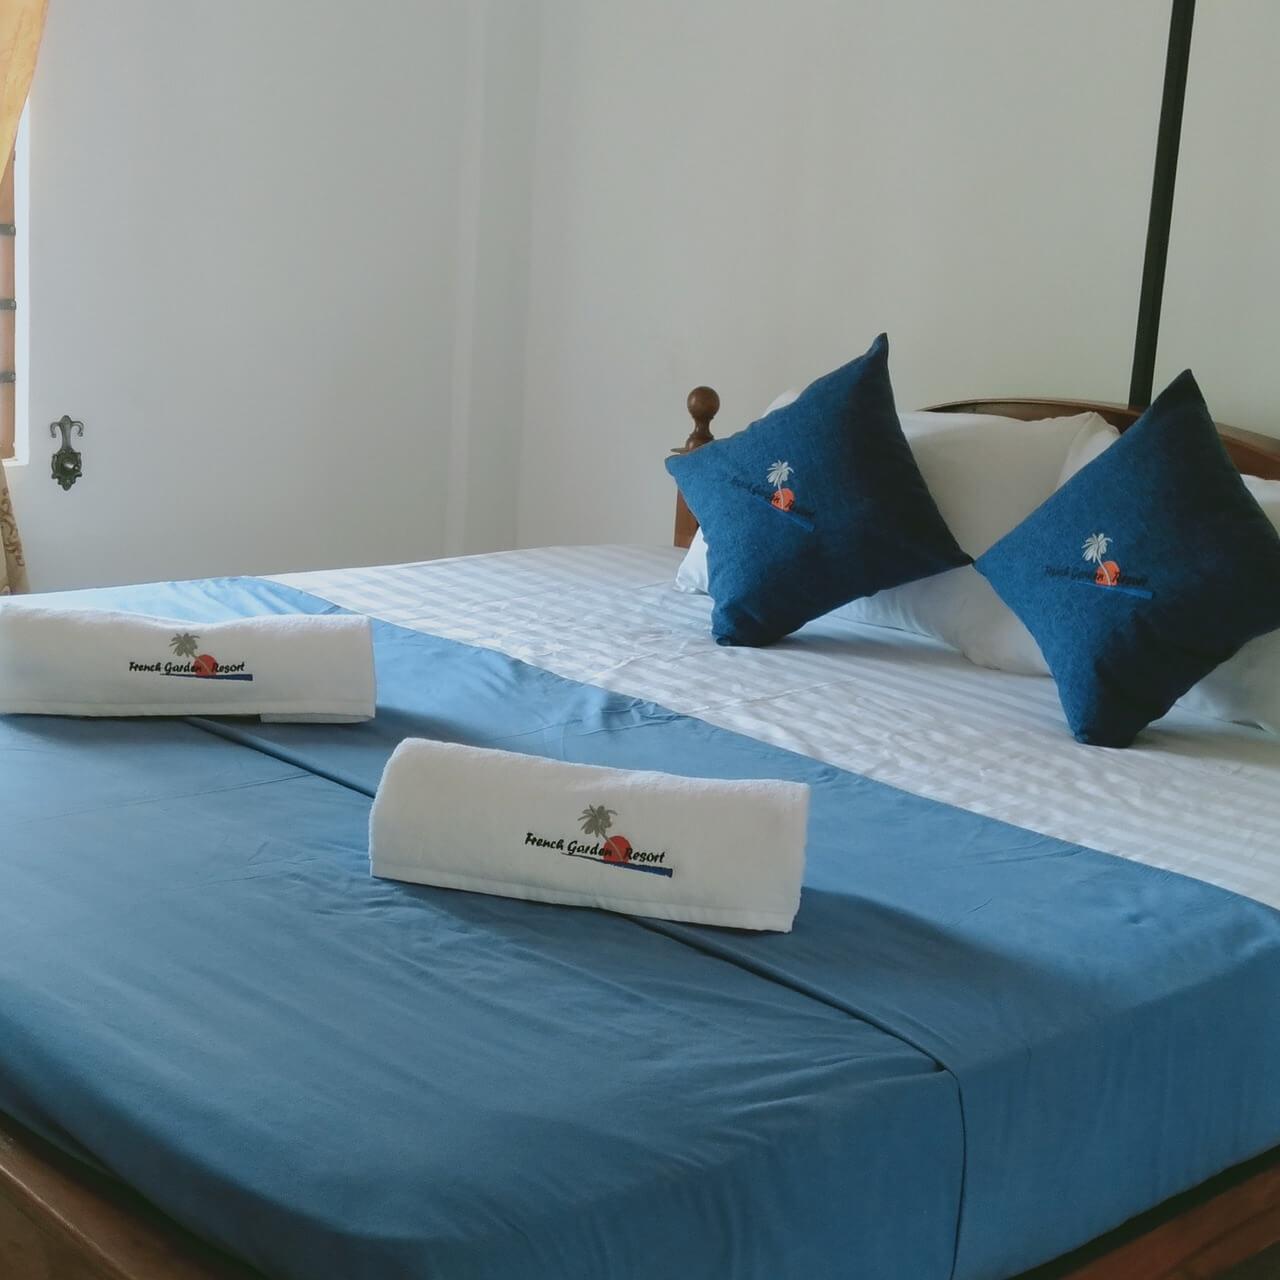 Arrange Pillow on a Bed